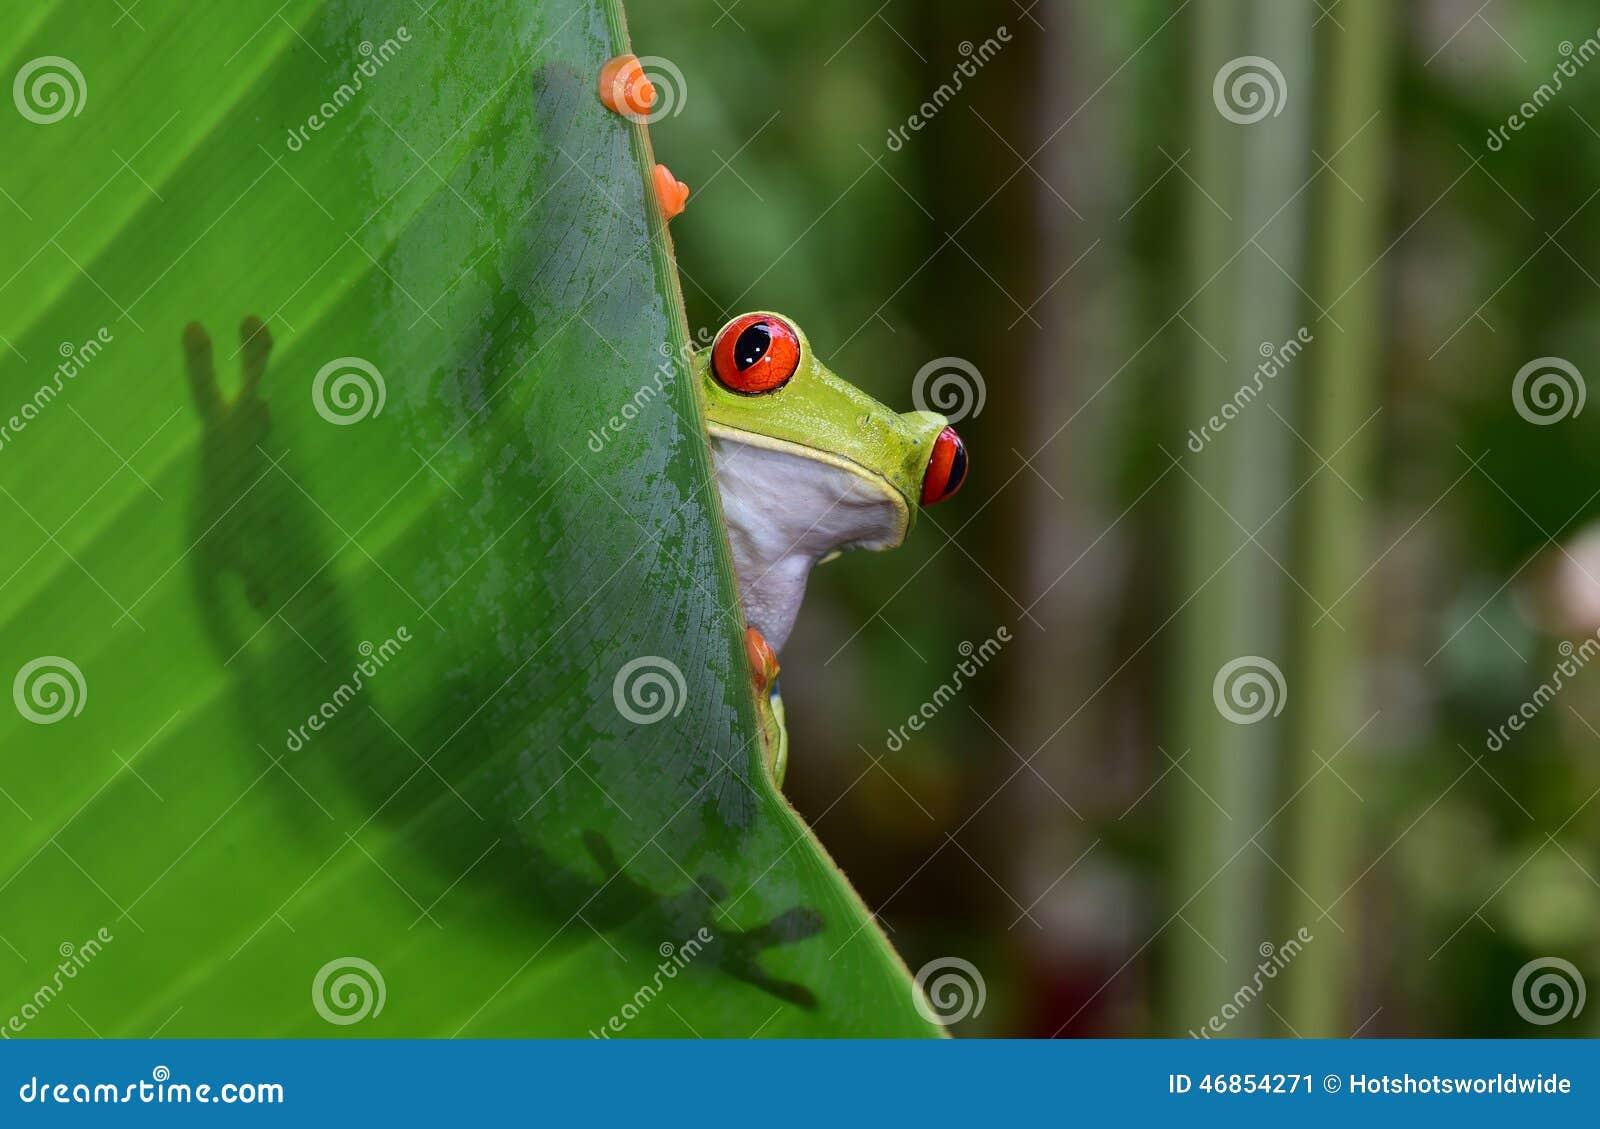 Le rouge a observé la grenouille d arbre verte, corcovado, Costa Rica